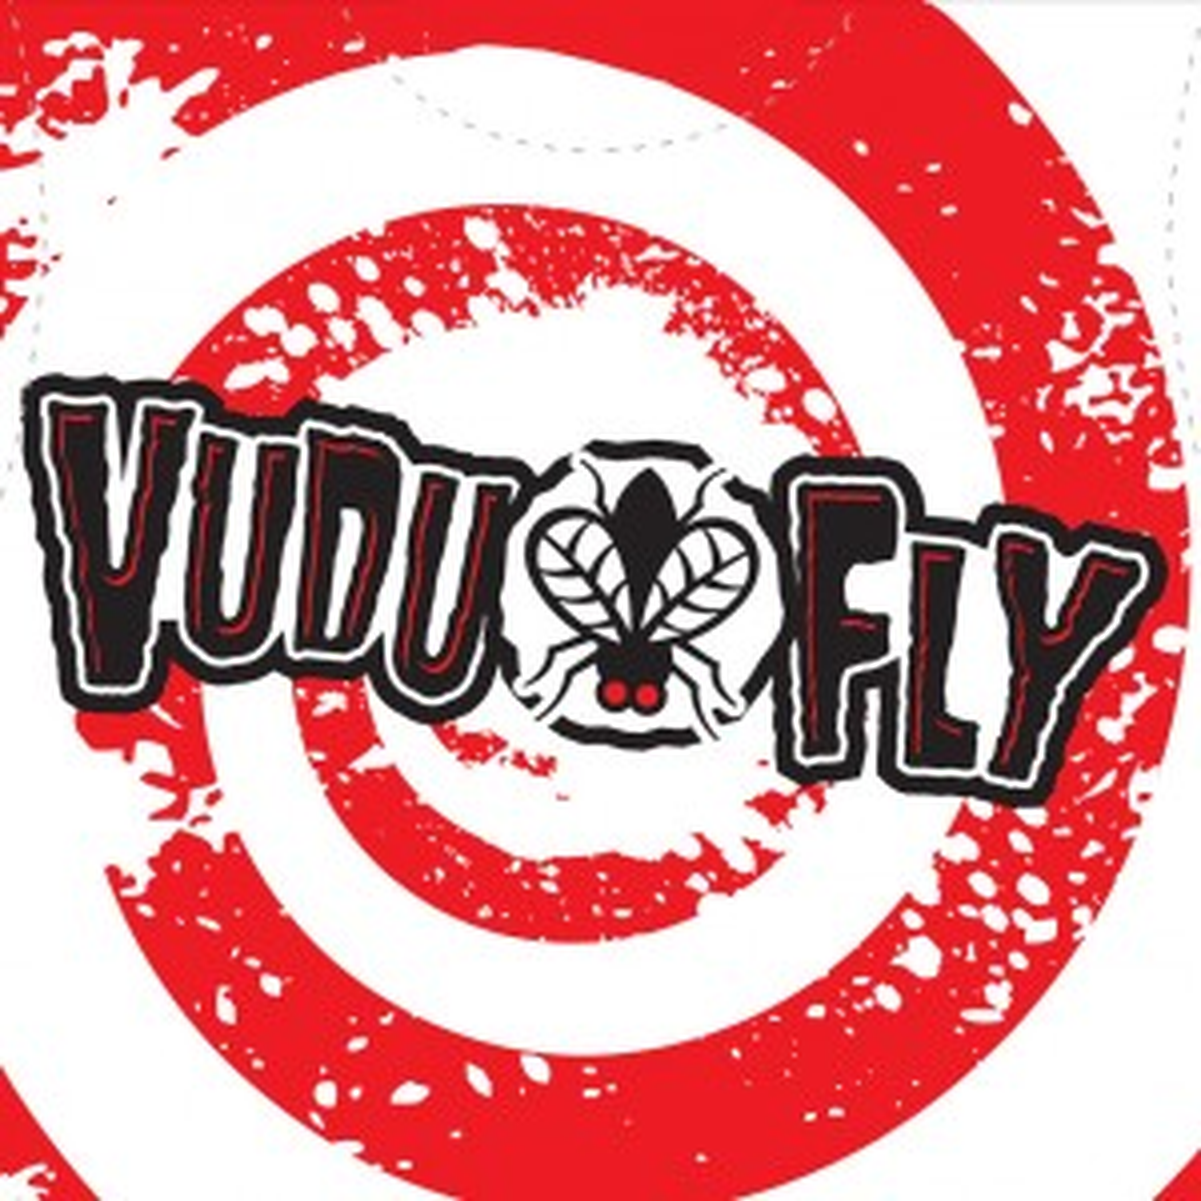 Vudu Fly